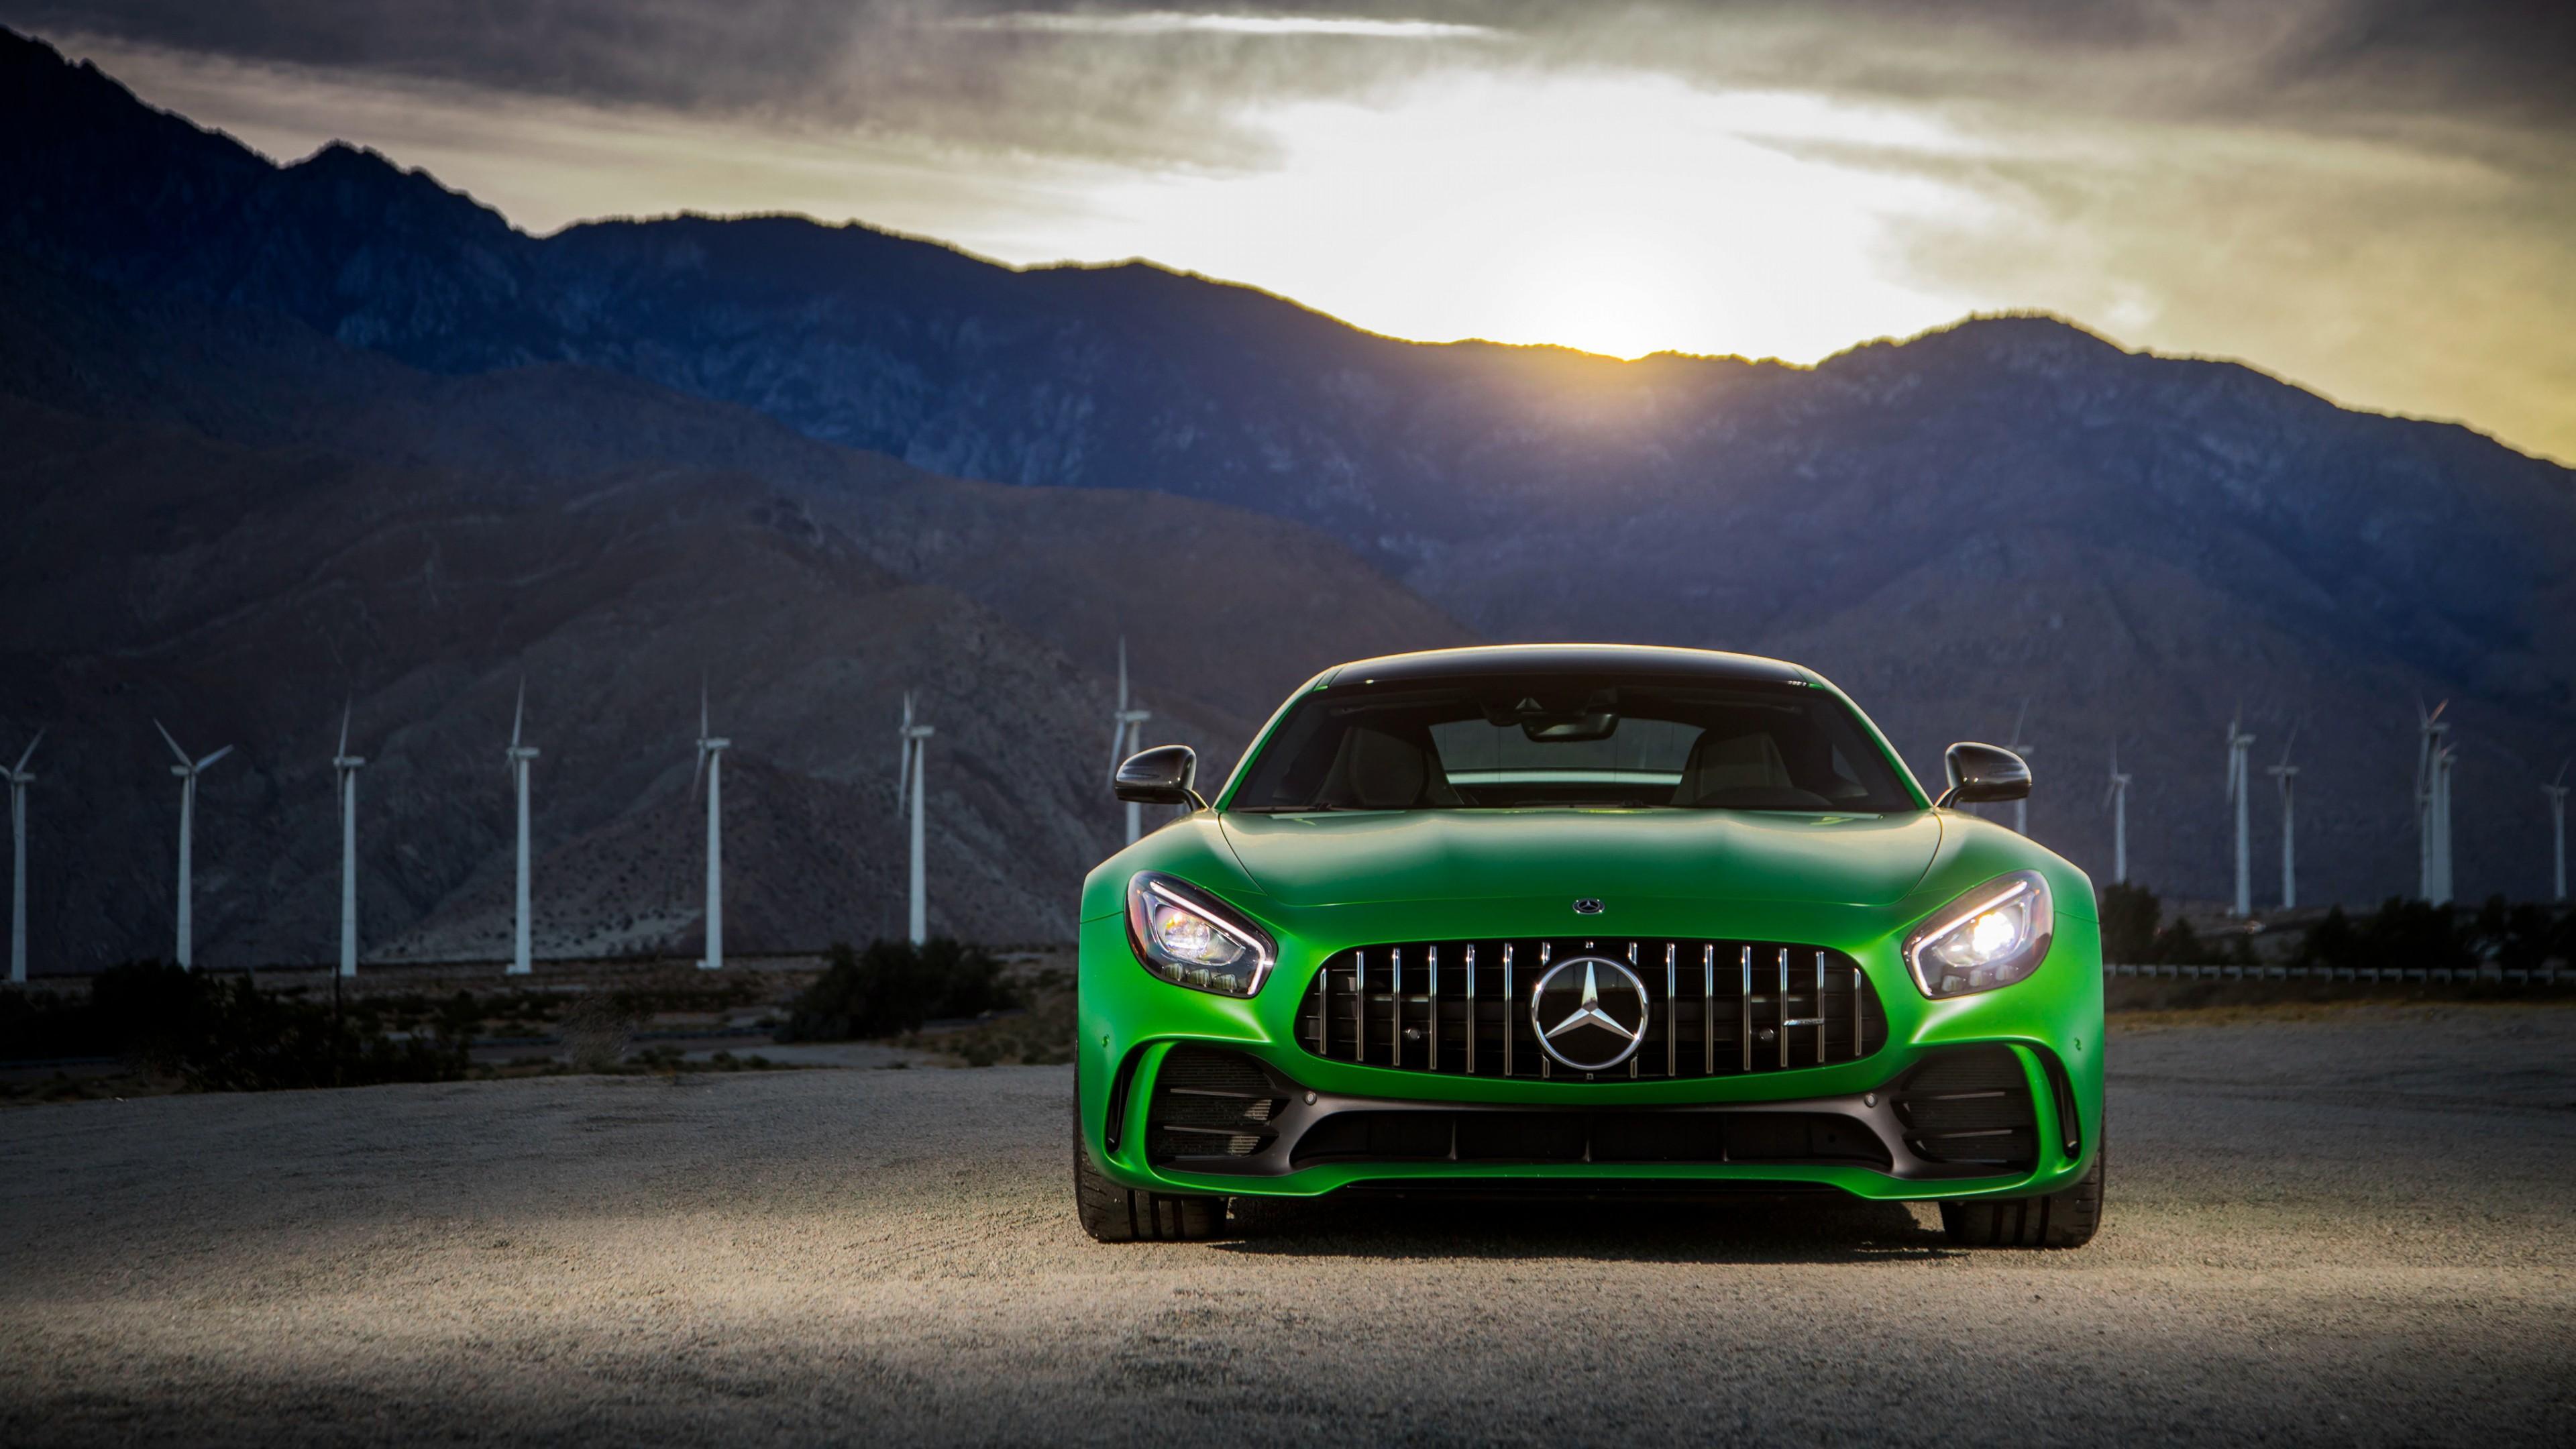 Mercedes Benz Gtr >> Wallpaper Mercedes Amg Gtr, 2018 Cars, 4k, Cars & Bikes #17088